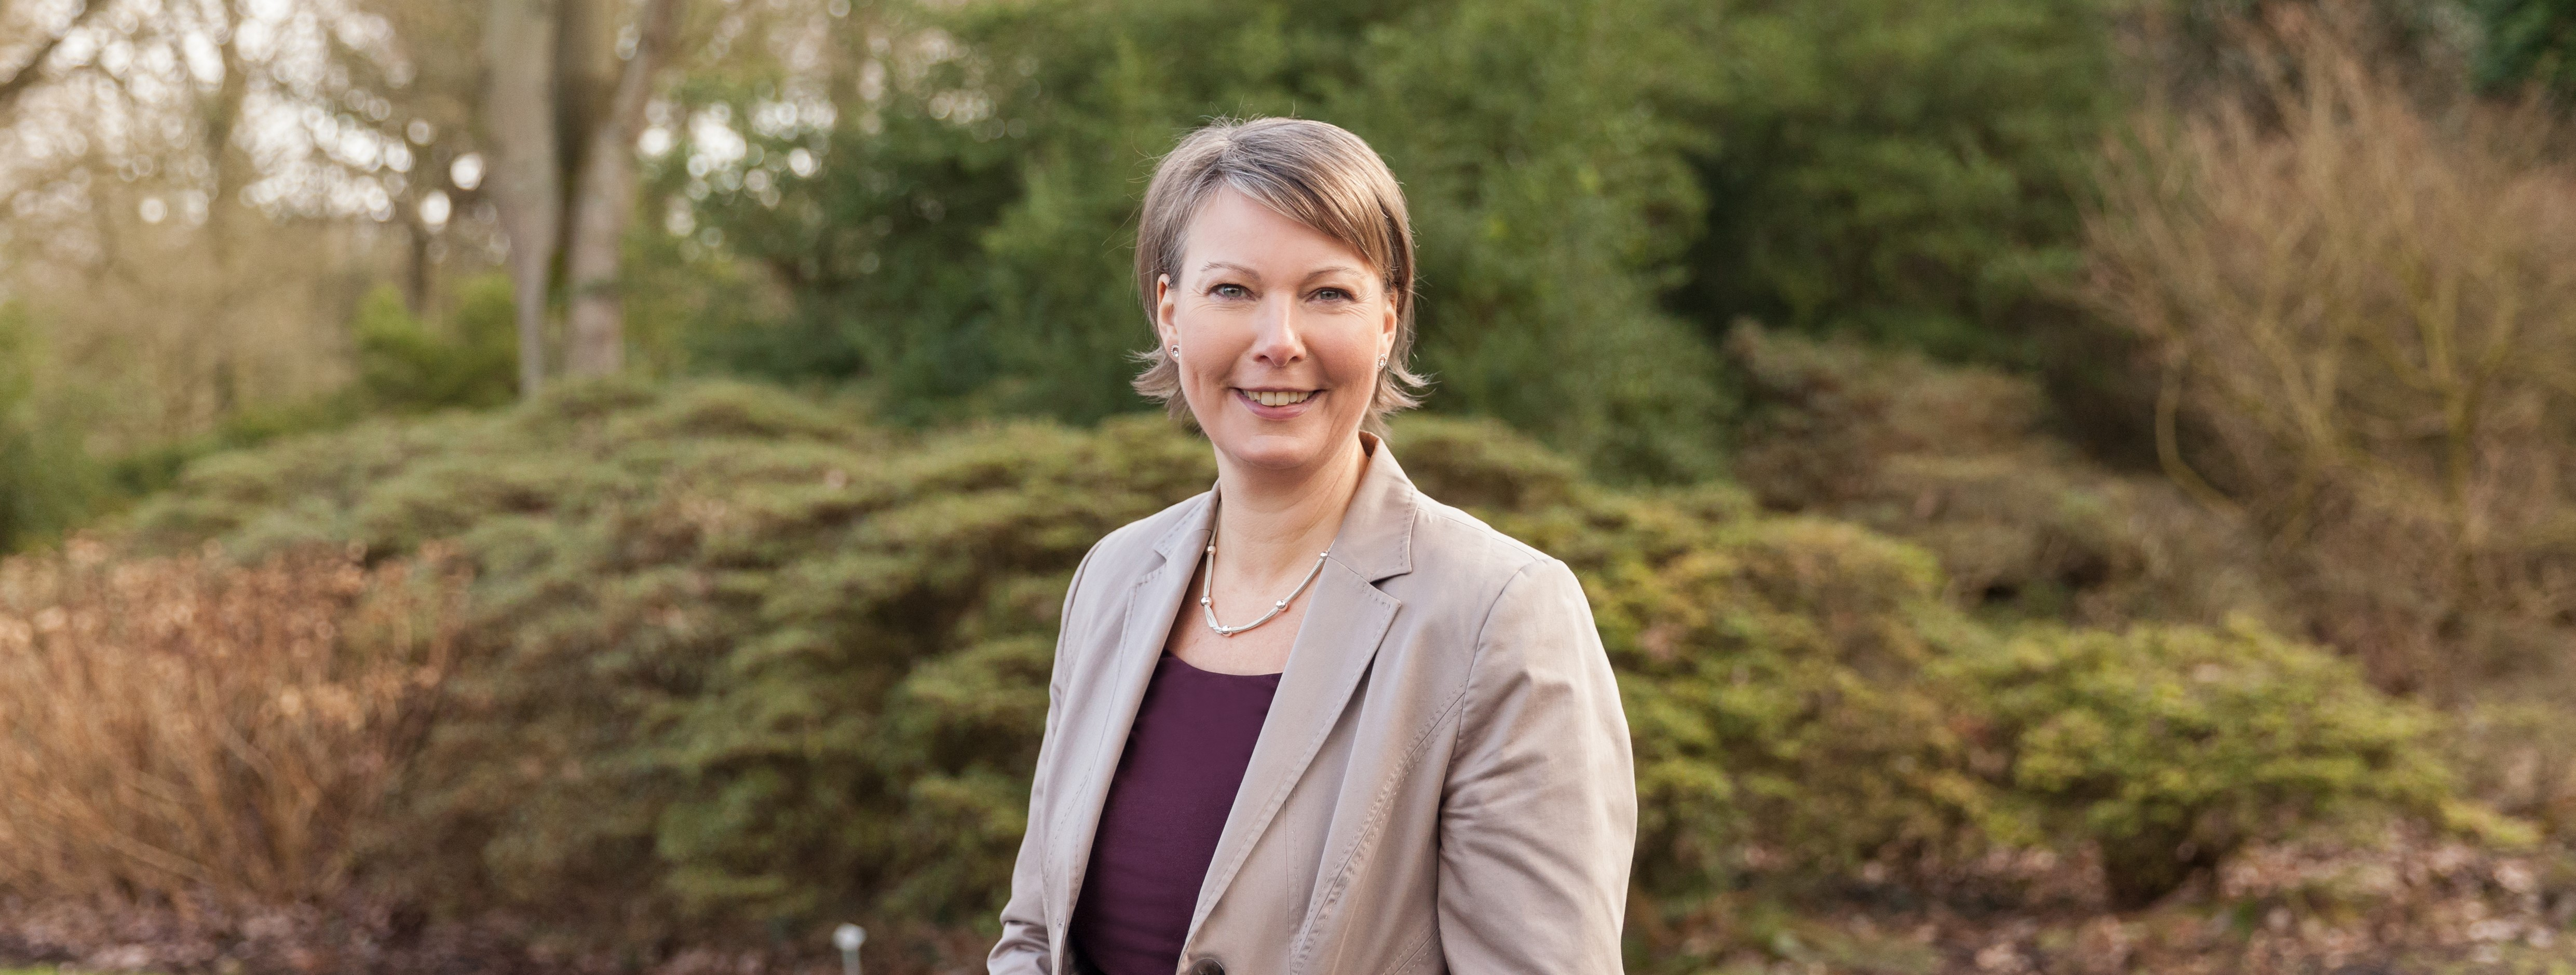 Andrea Ostendorf Coaching Training Beratung Bremen Führungskräfte